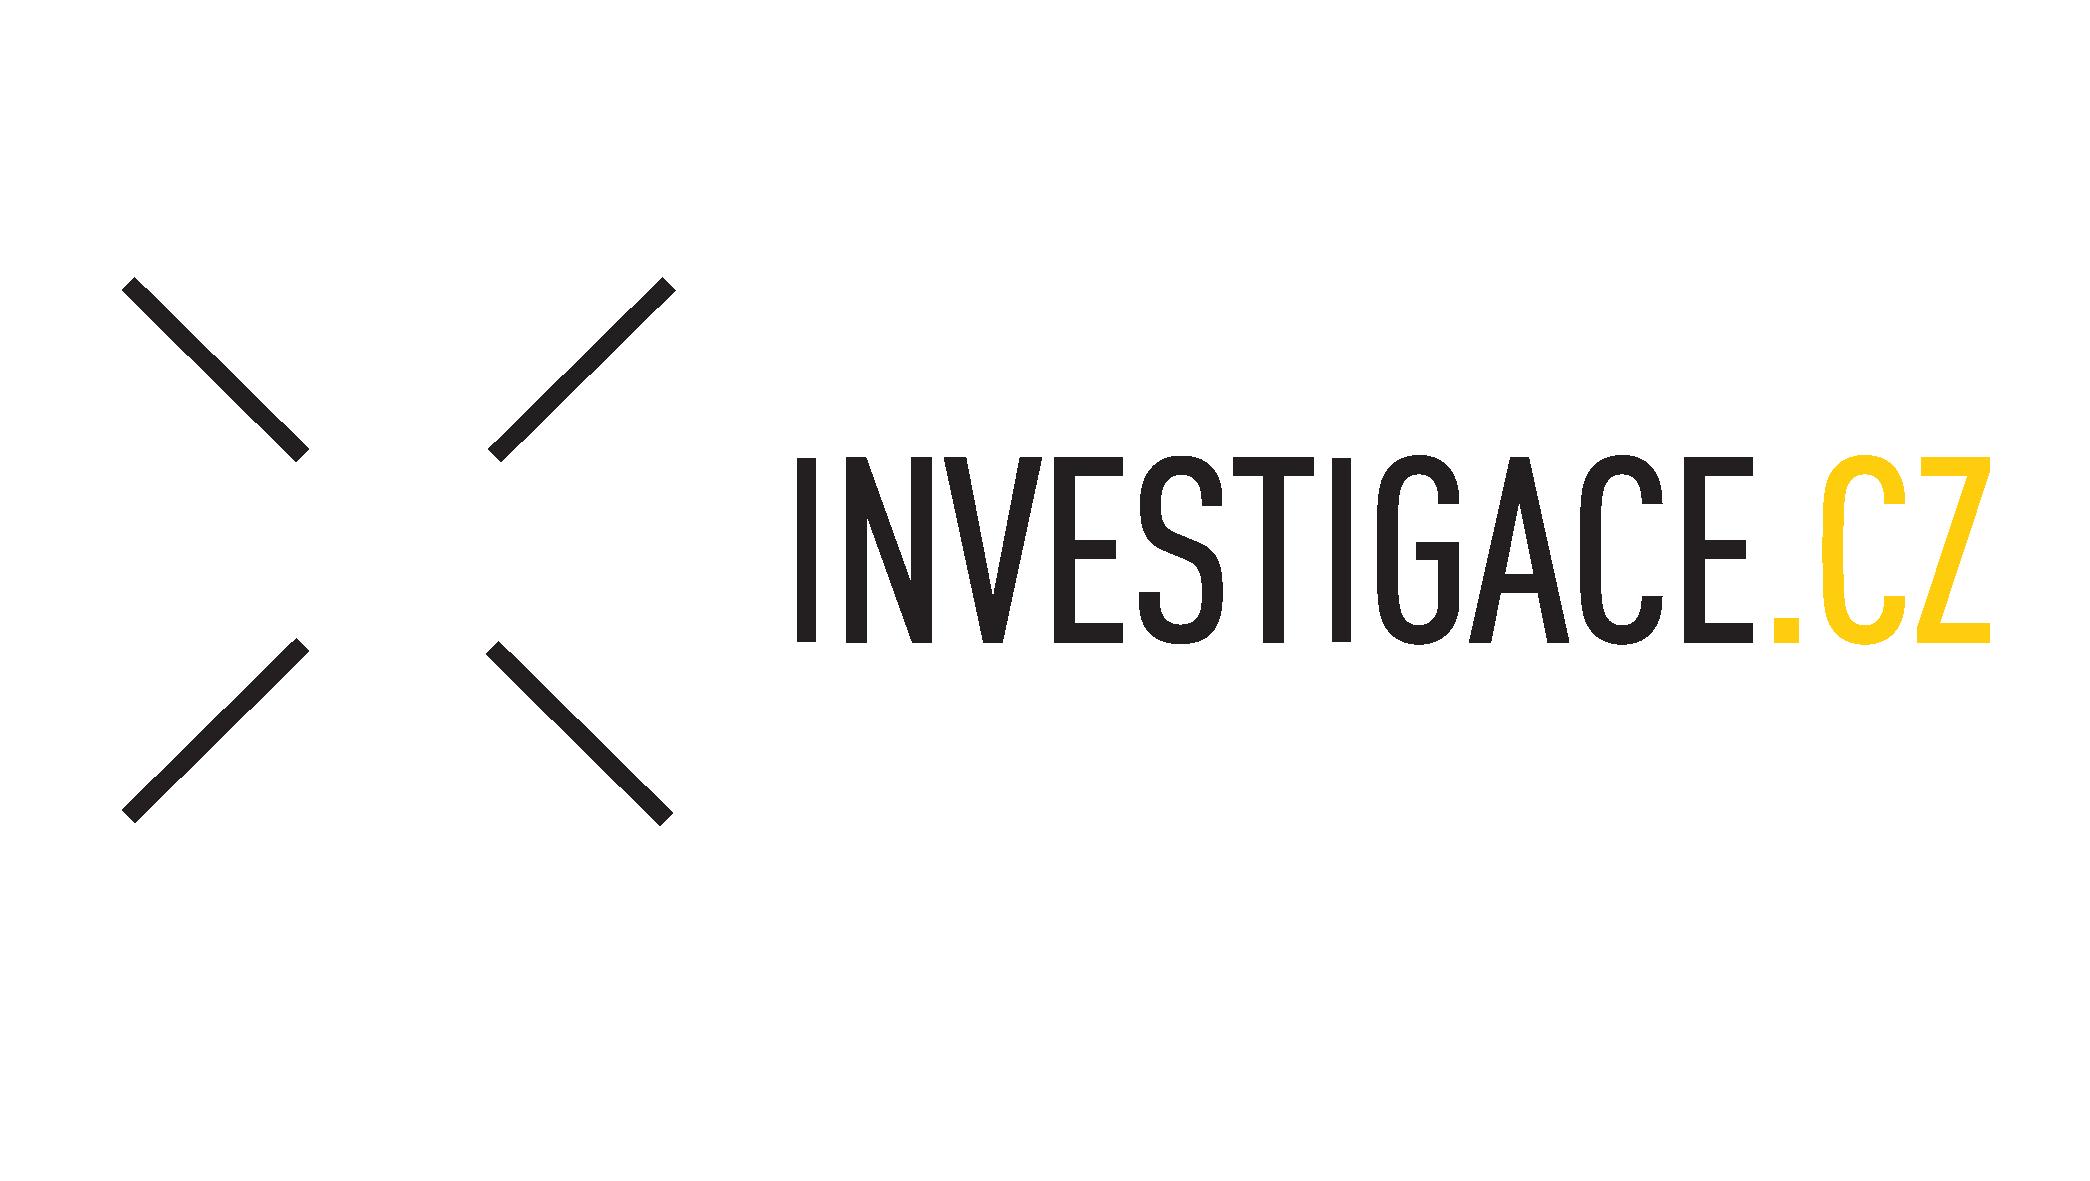 investigace.cz